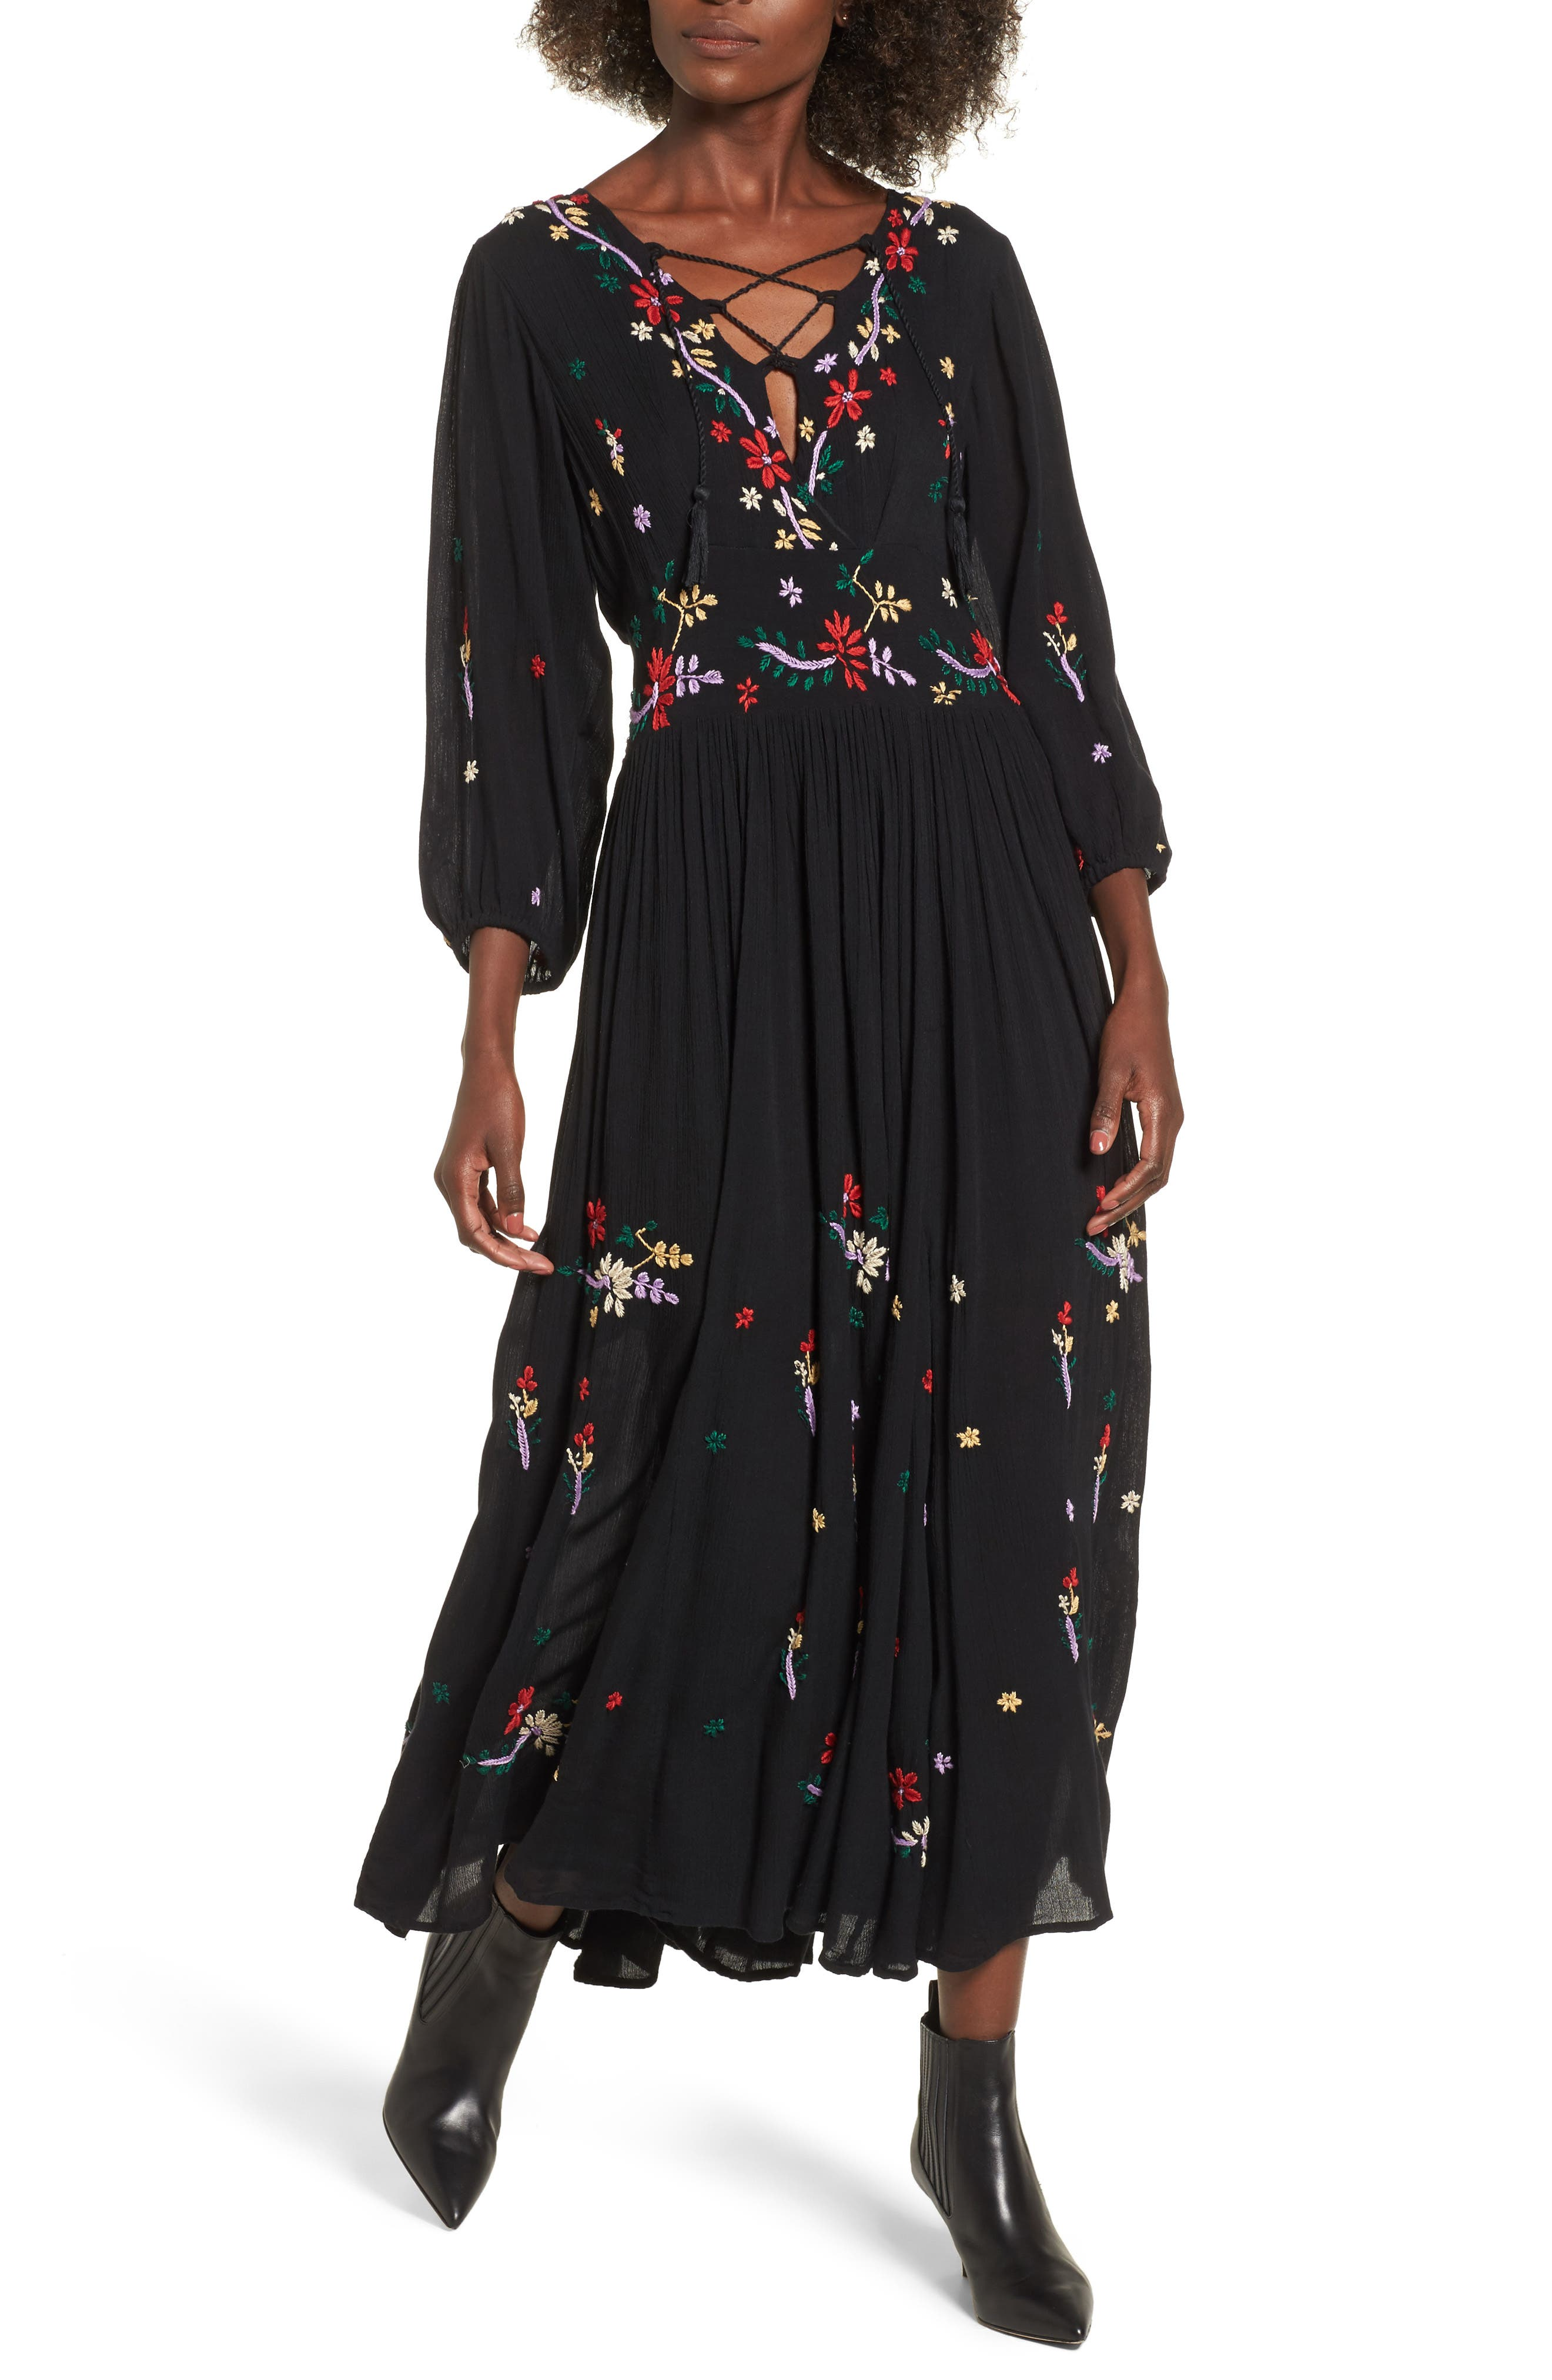 Main Image - Raga Sammy Embroidered Dress